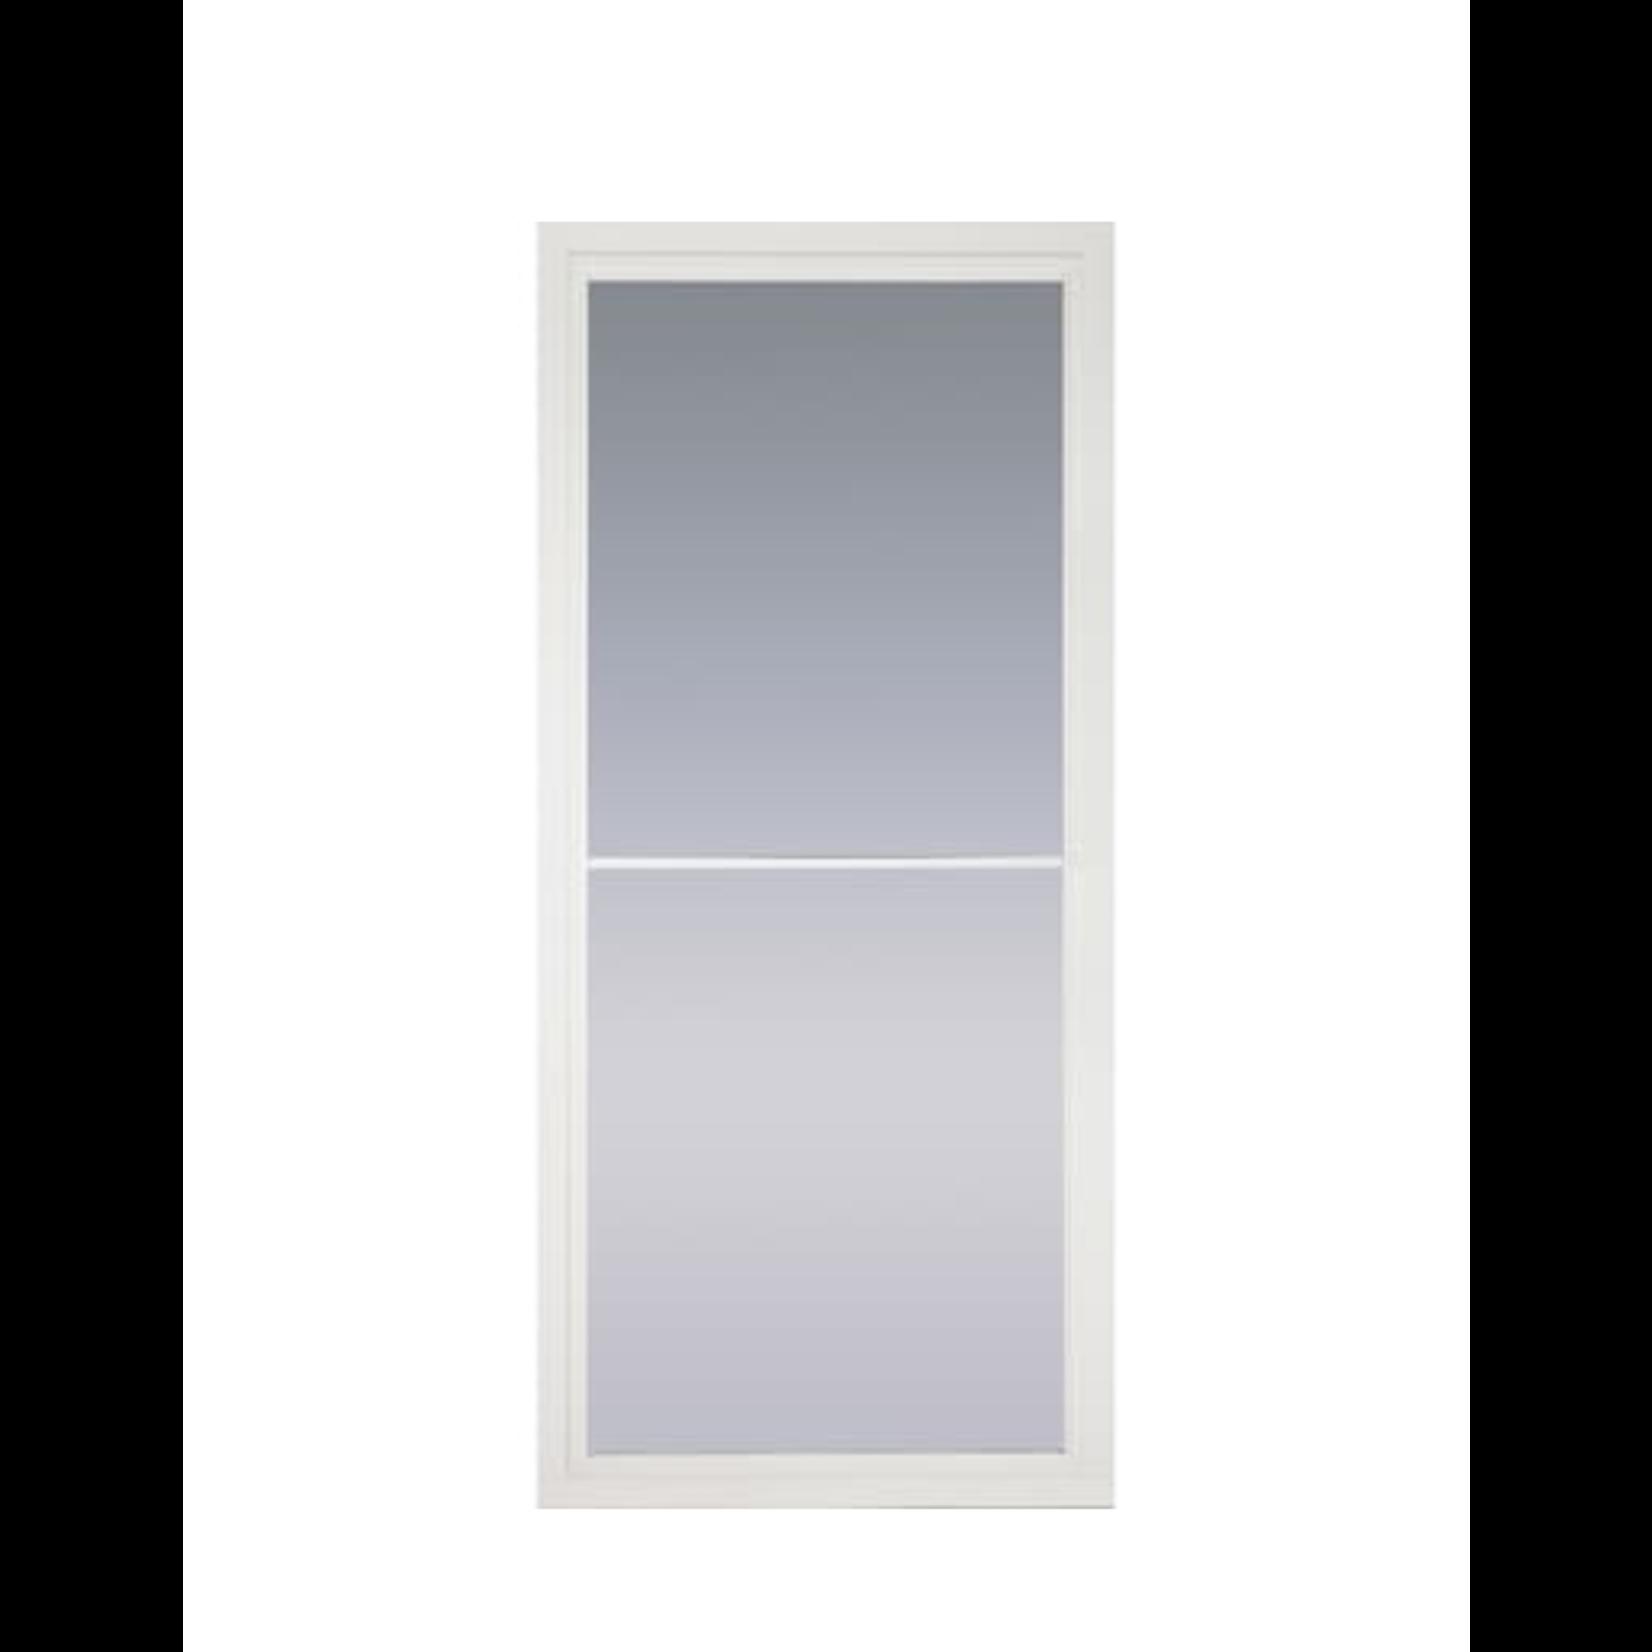 10423 Pella White Full-View Storm Door